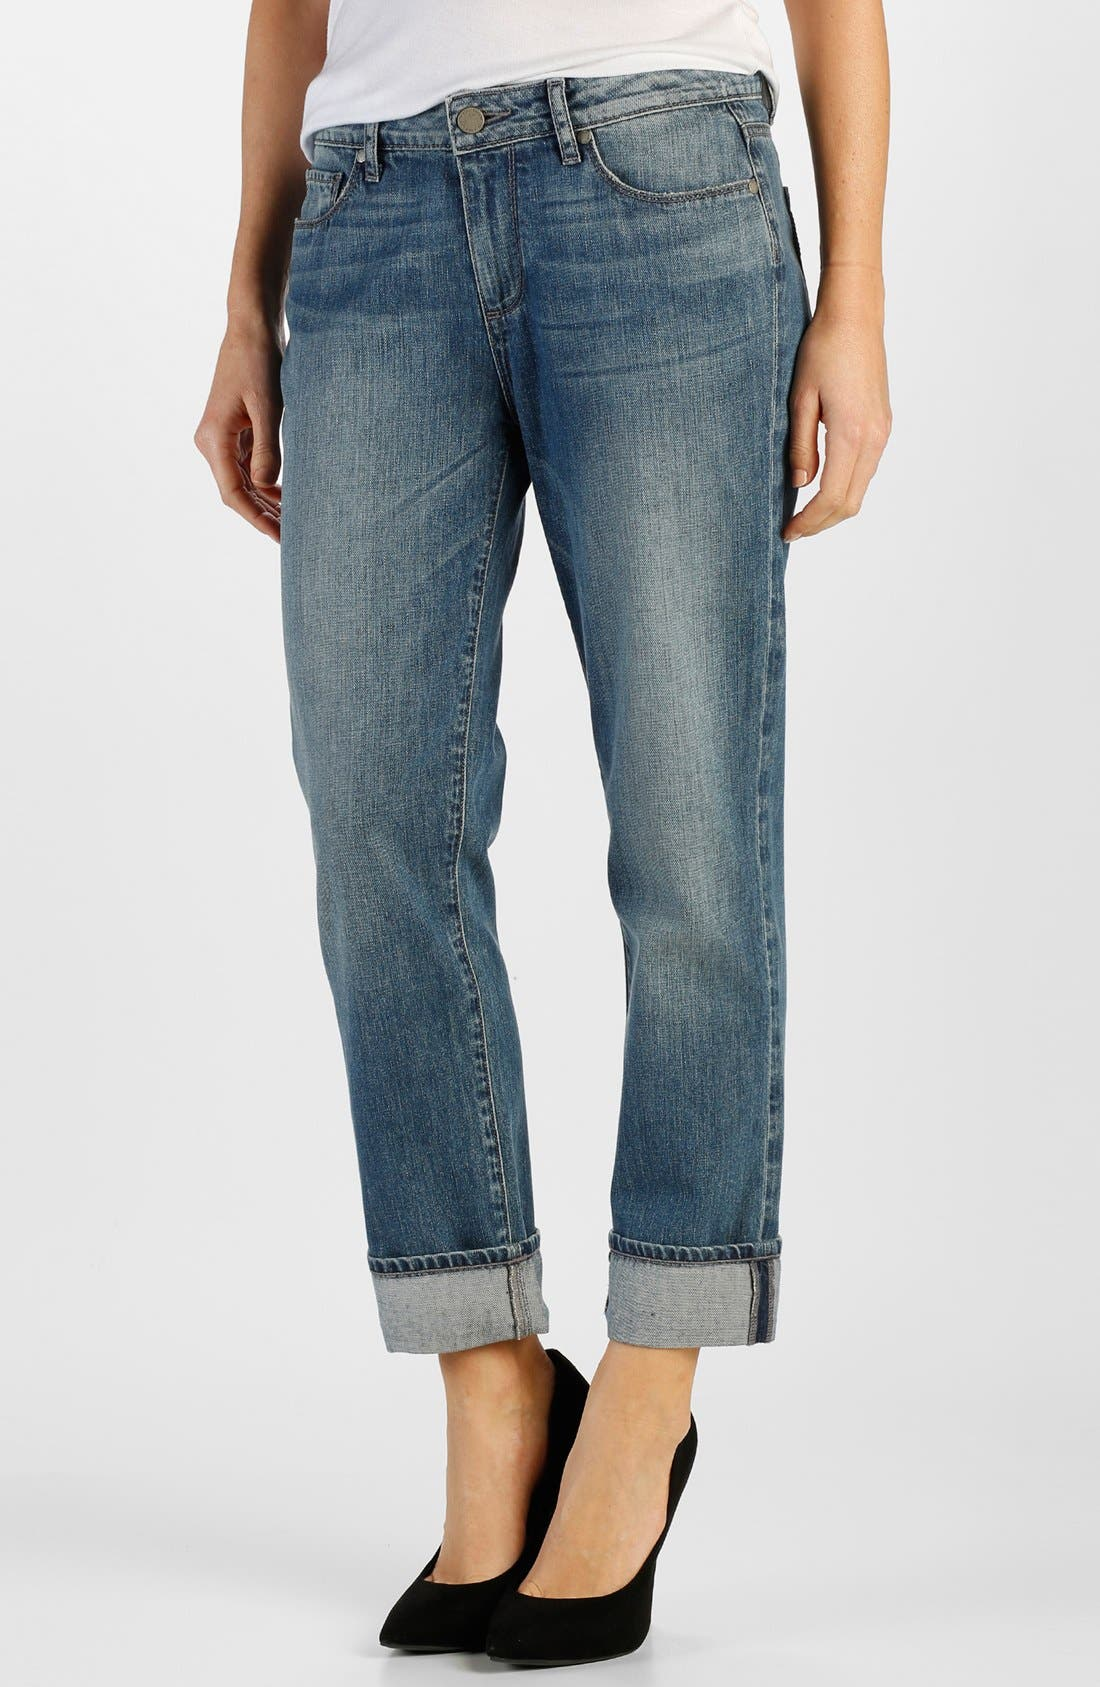 Main Image - Paige Denim 'Porter' Boyfriend Jeans (Dazeley)